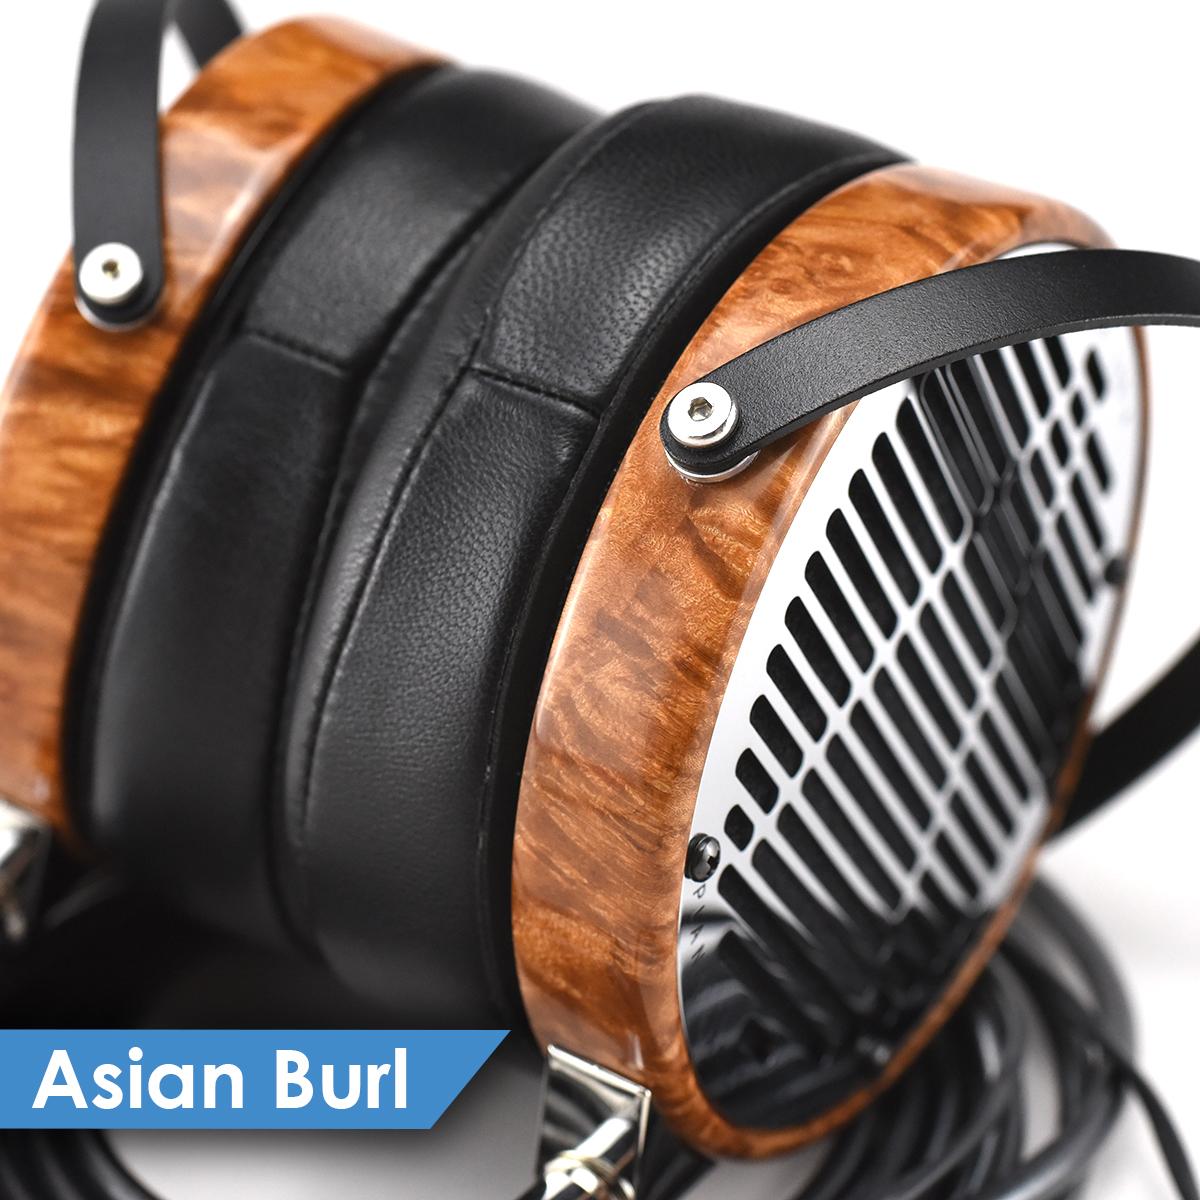 LCD-4 Asian Burl